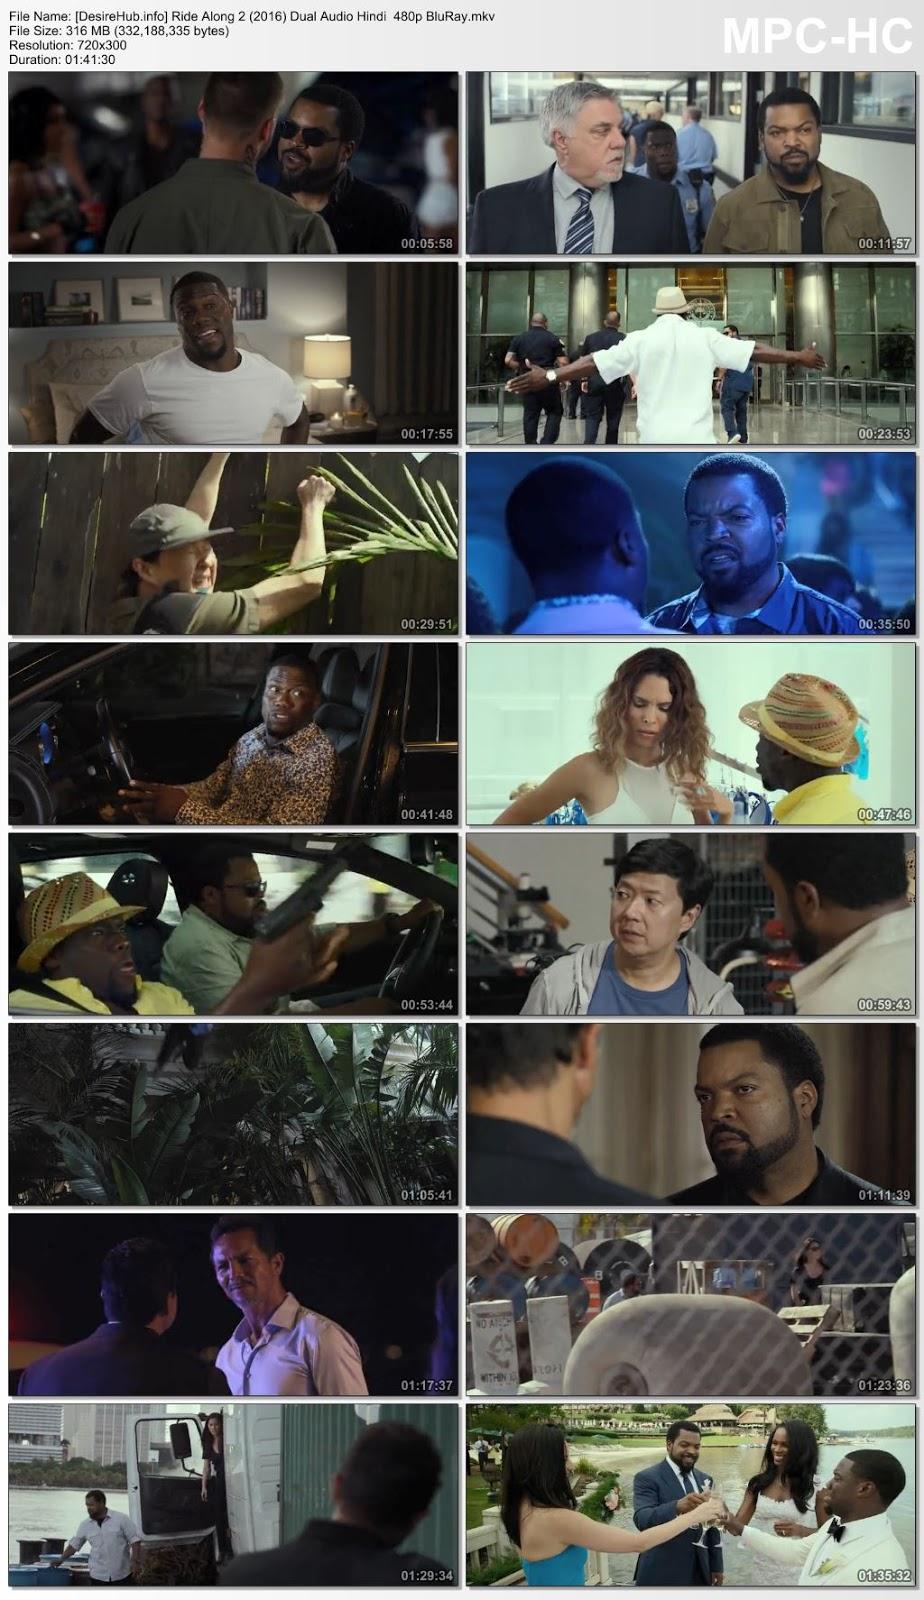 Ride Along 2 2016 Dual Audio Hindi 480p BluRay 300MB Desirehub